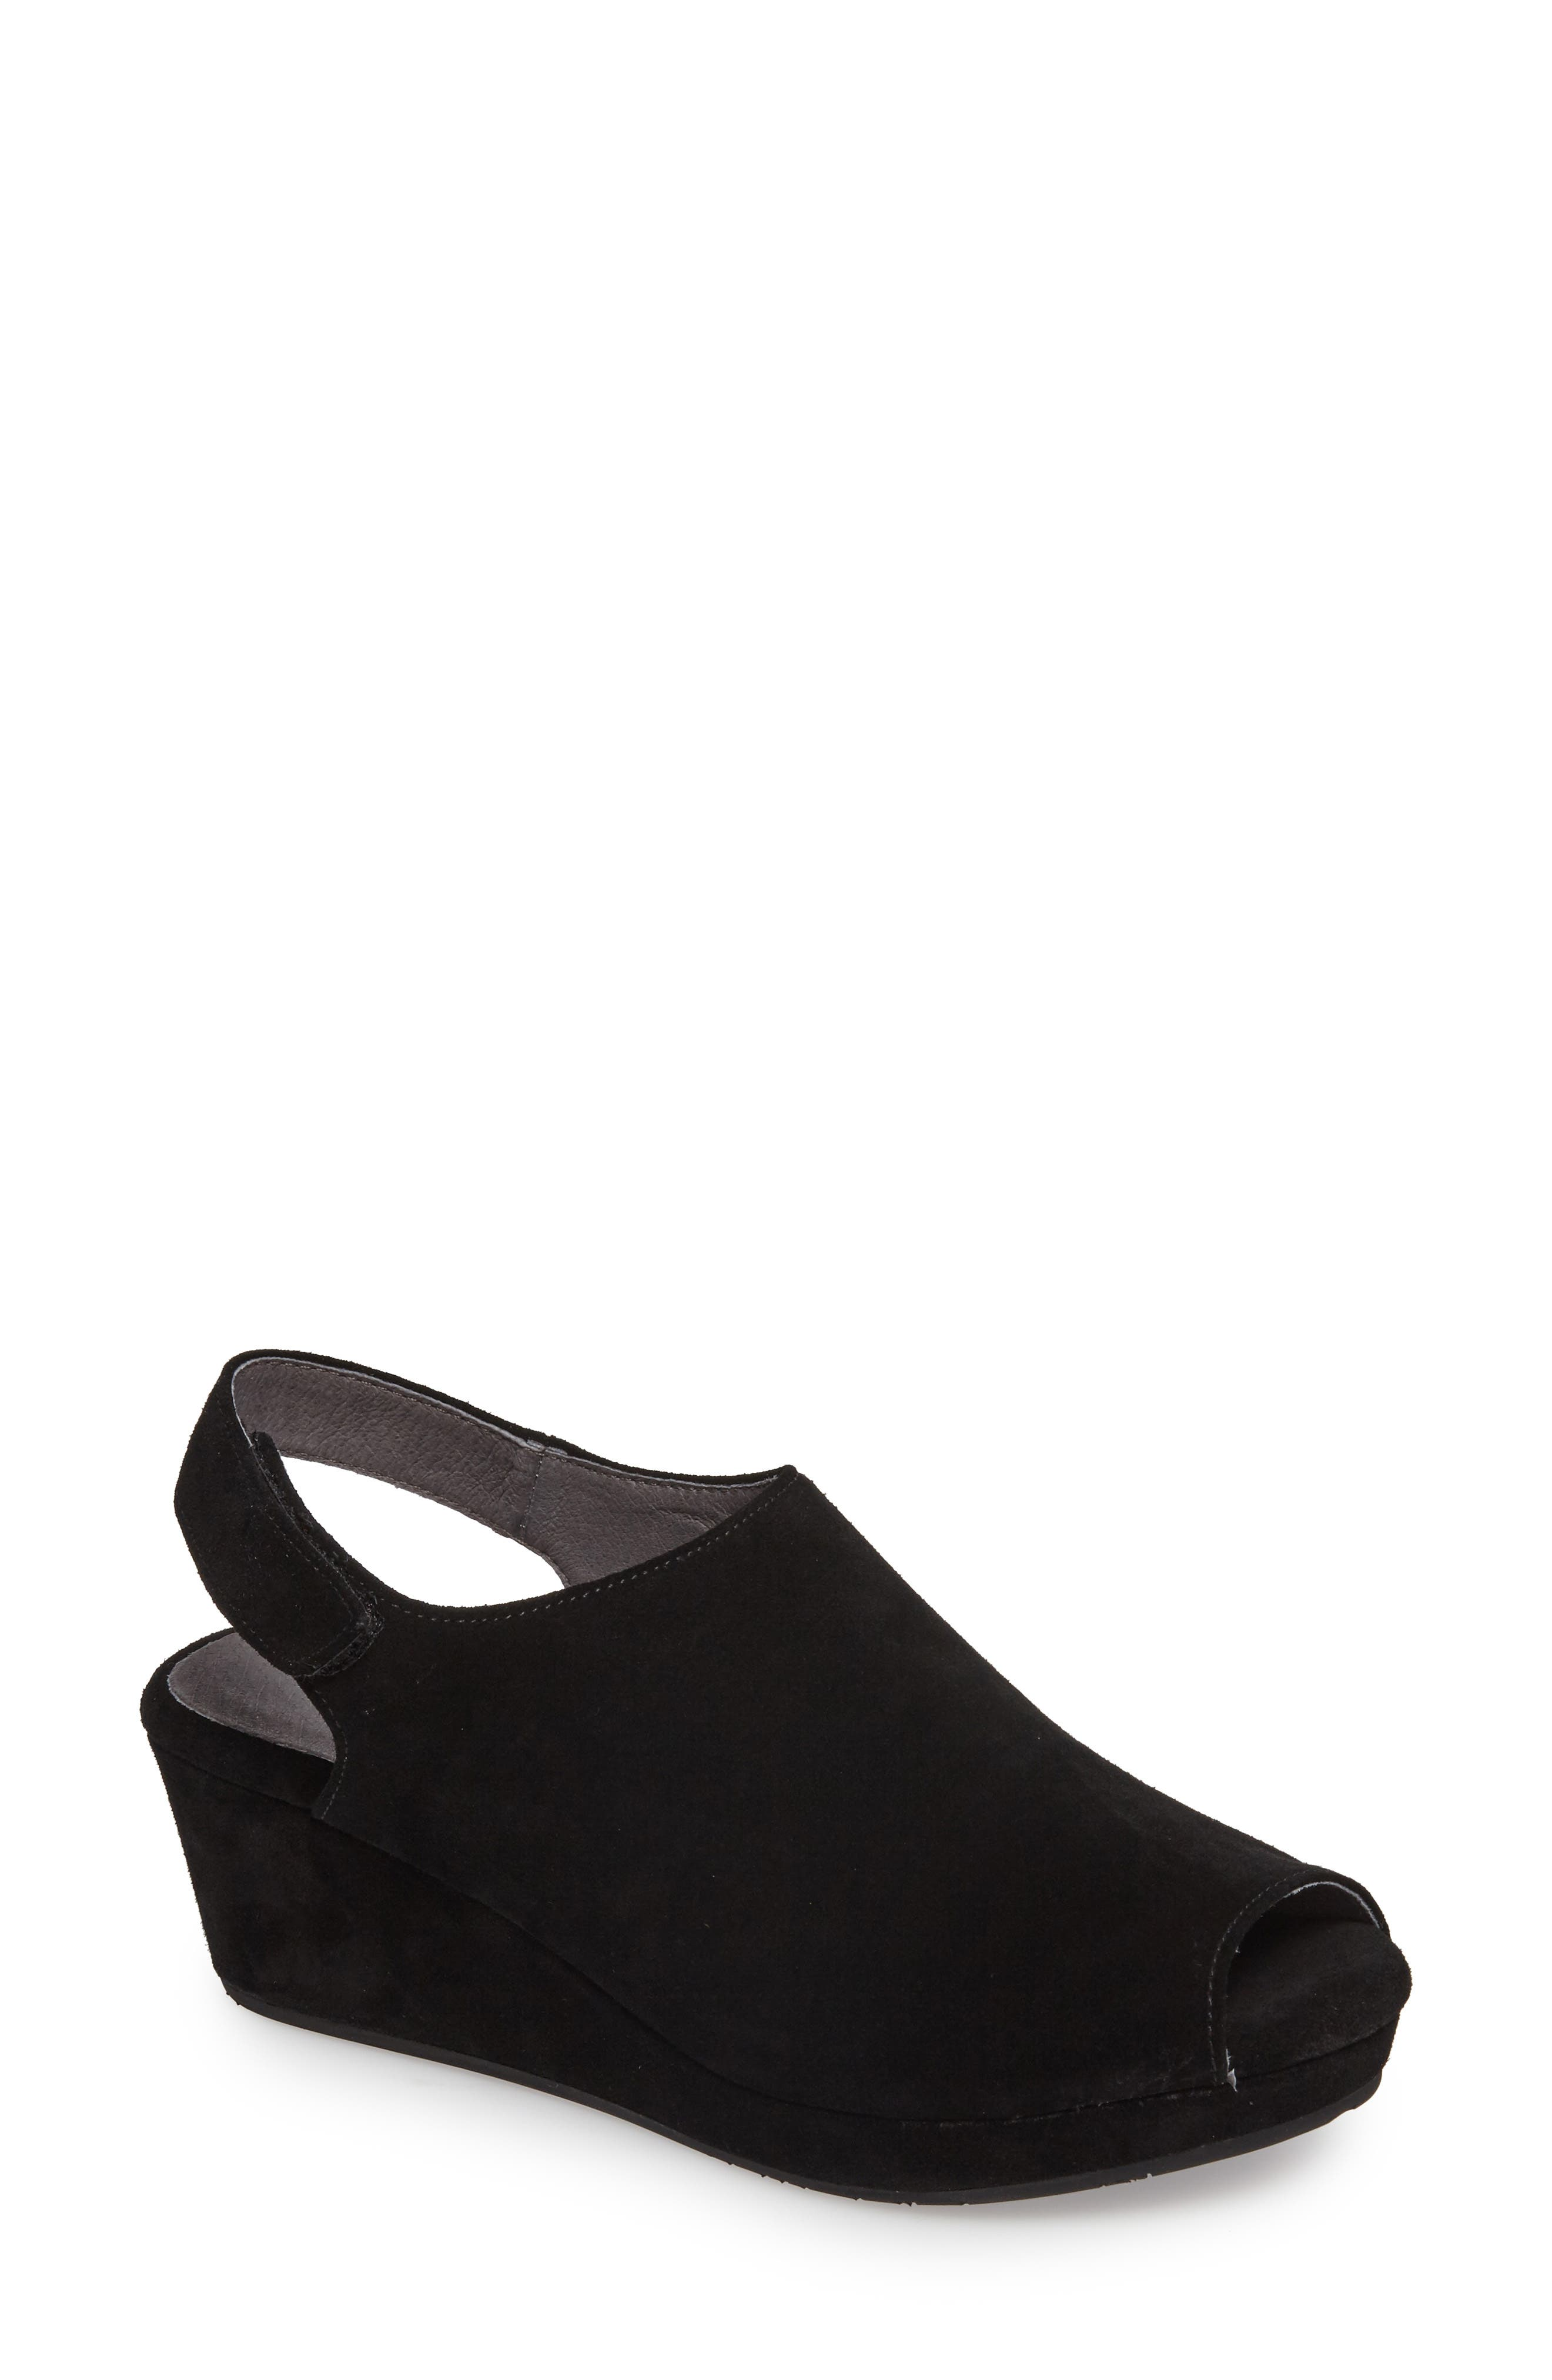 Yana Wedge Sandal,                             Main thumbnail 1, color,                             BLACK SUEDE